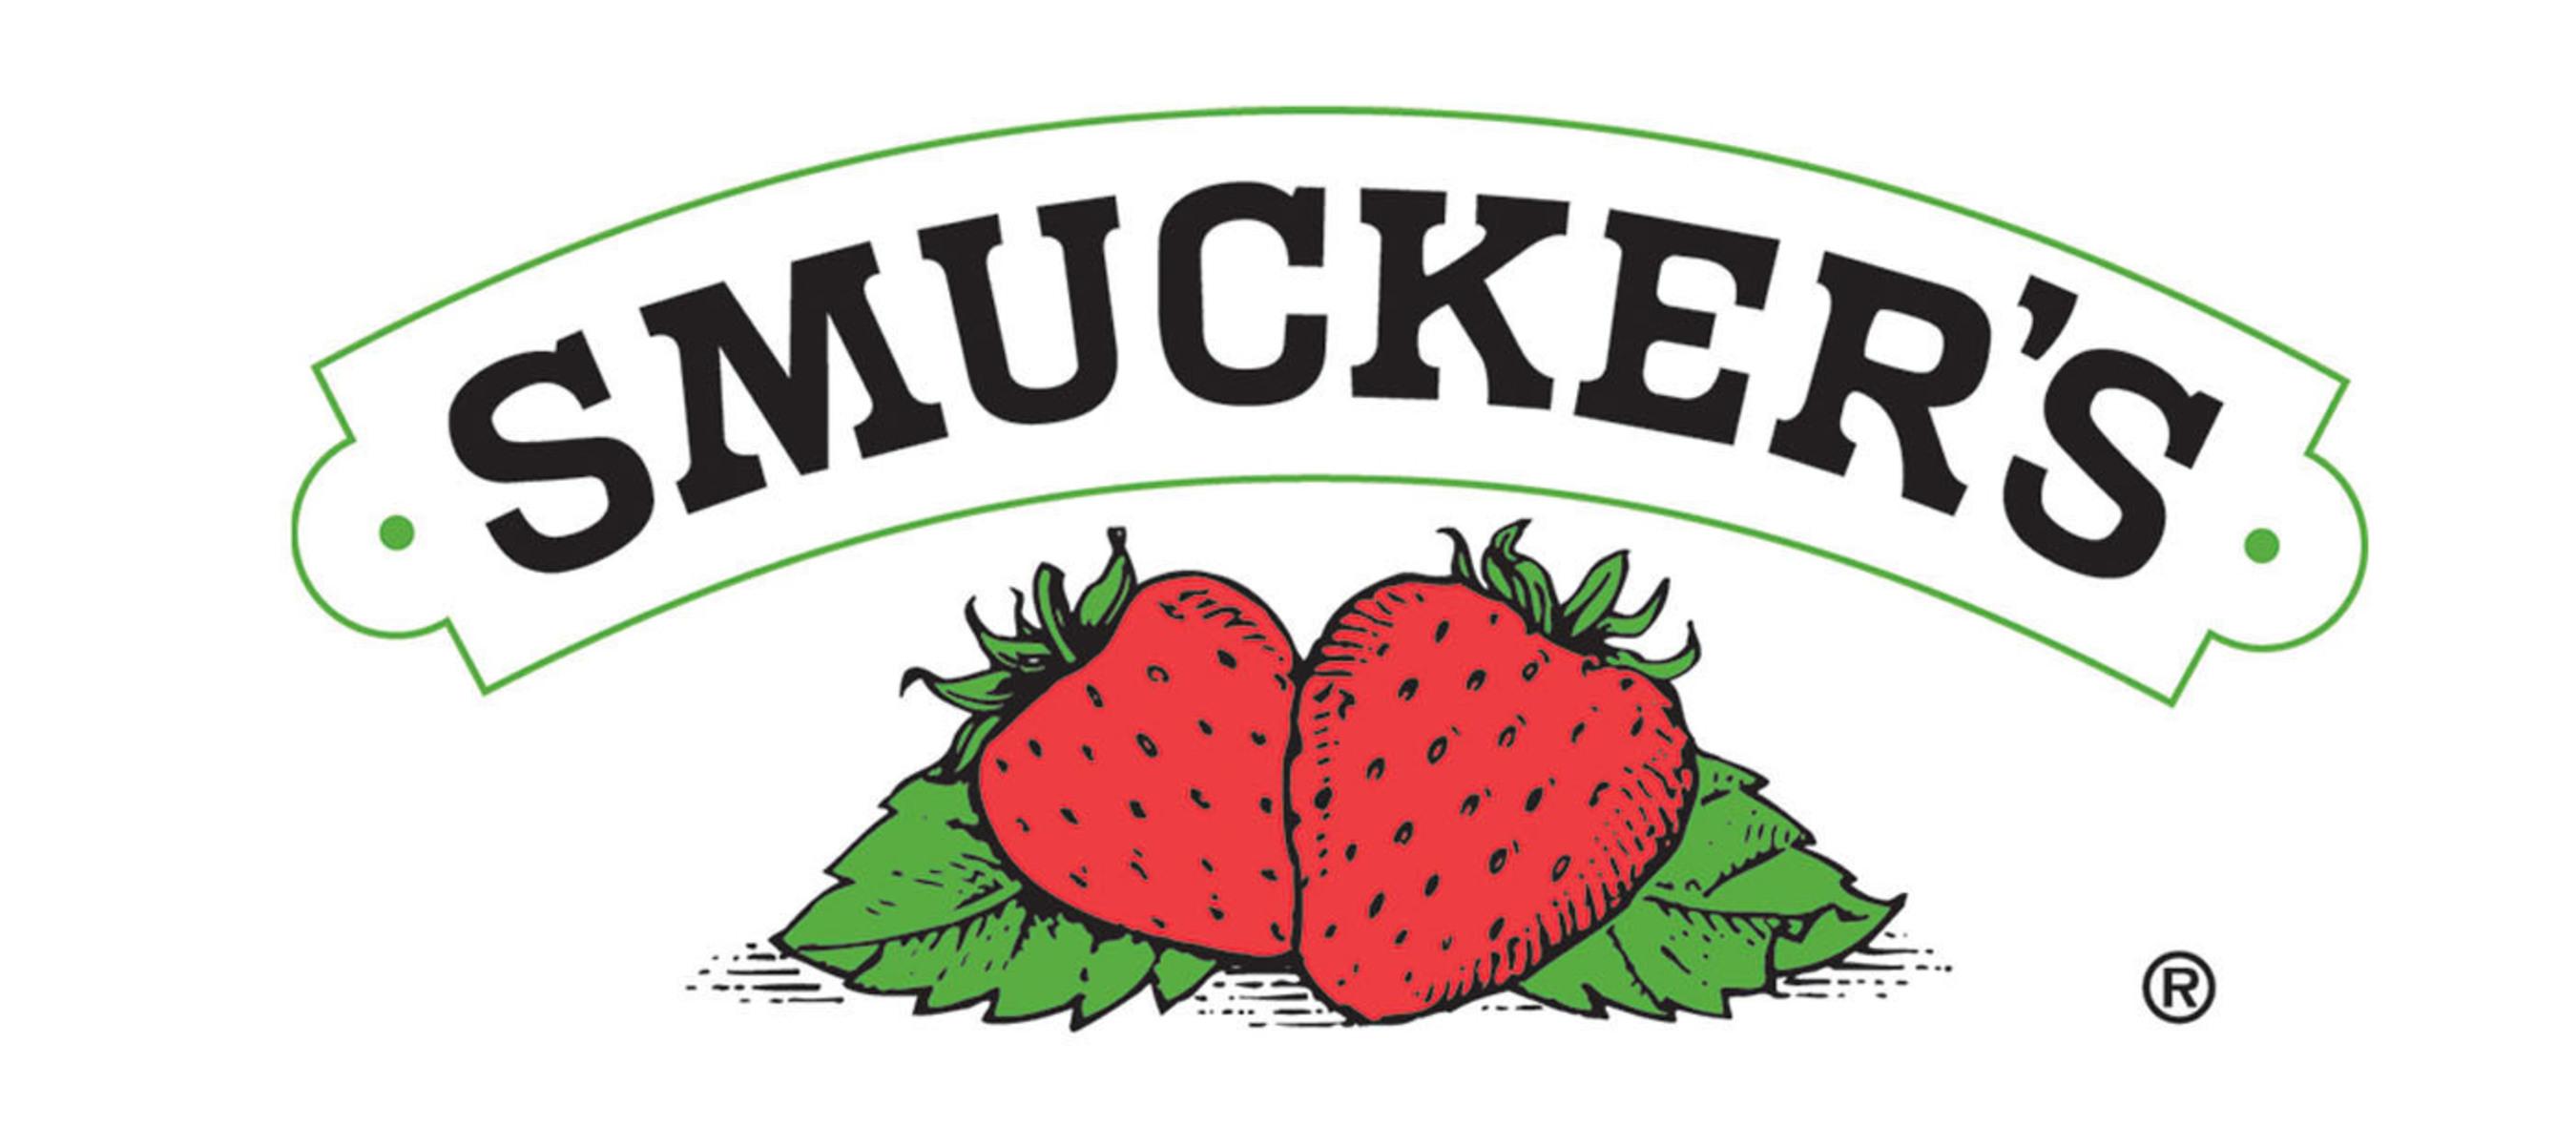 The J. M. Smucker Company logo